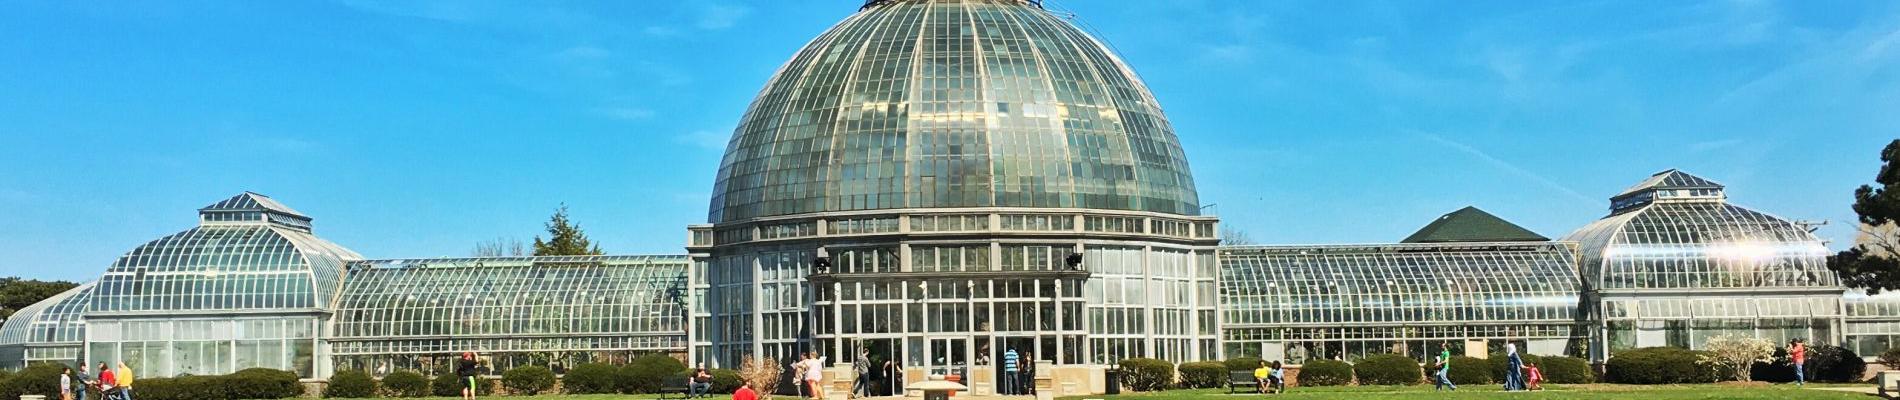 Belle Isle: Detroit's Gem